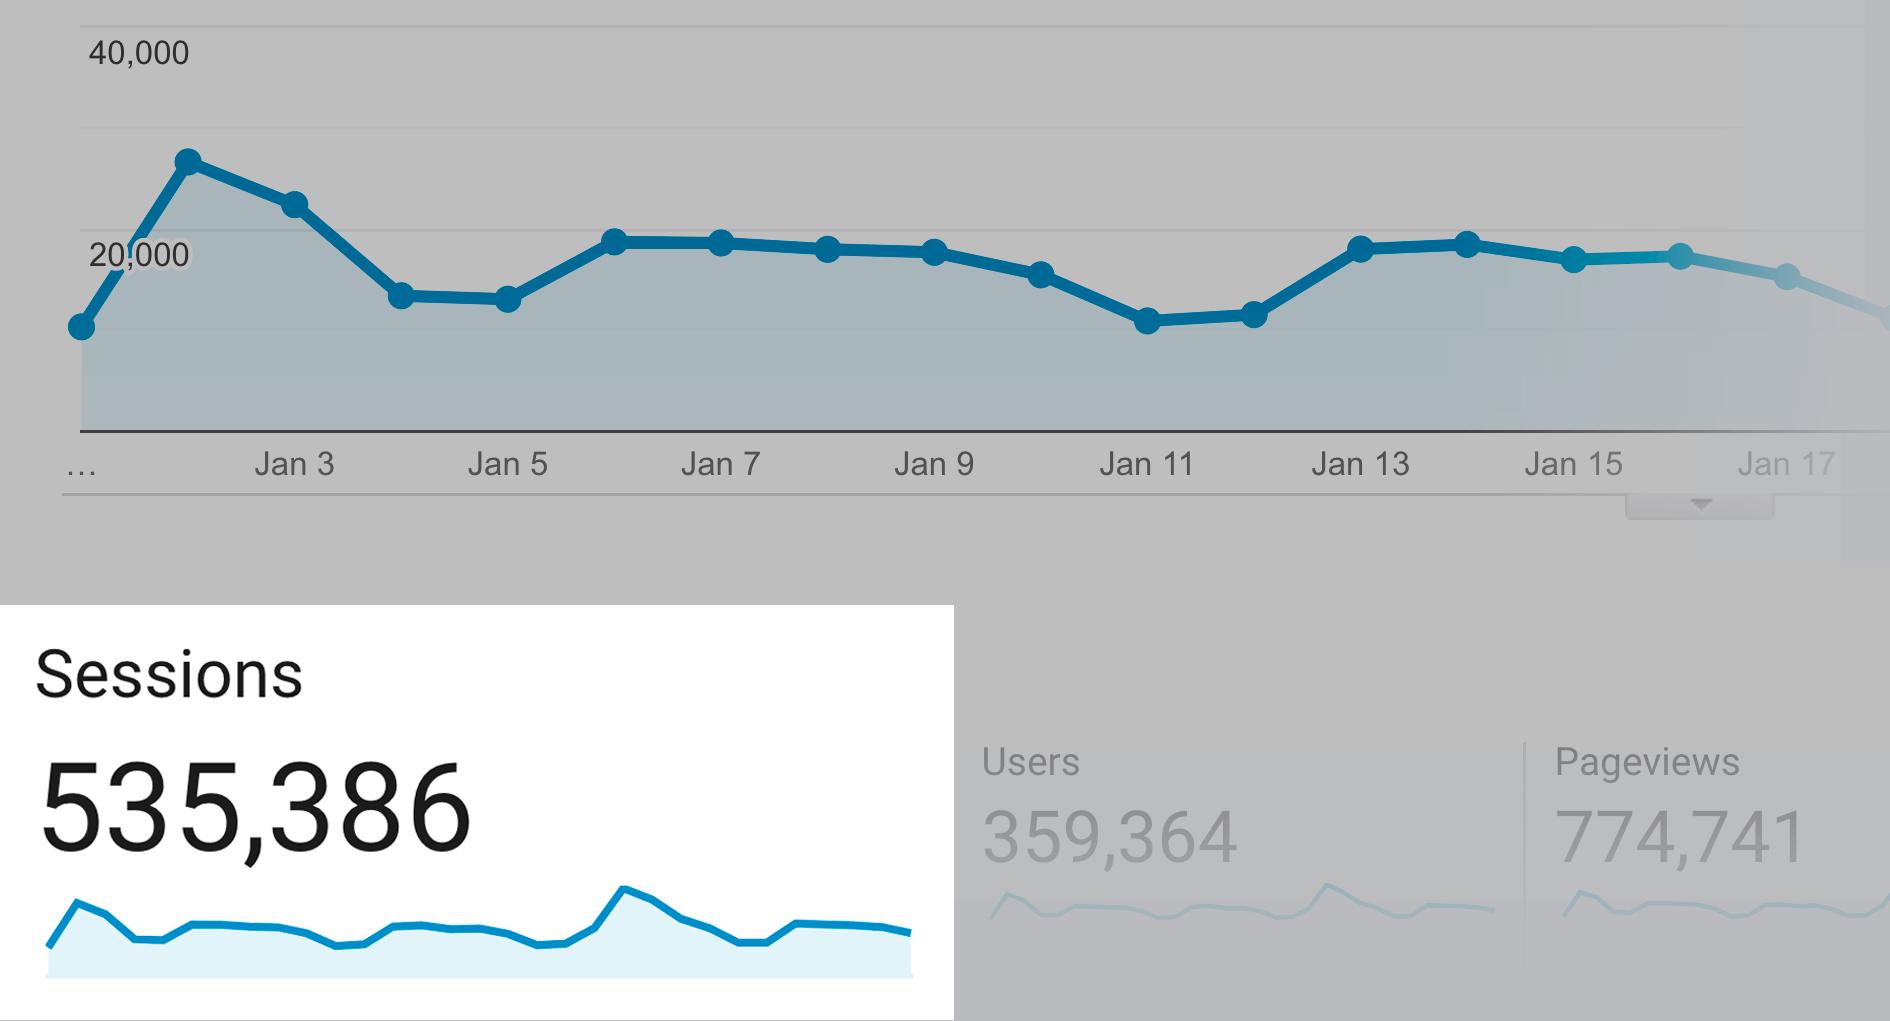 Backlinko – Monthly traffic growth